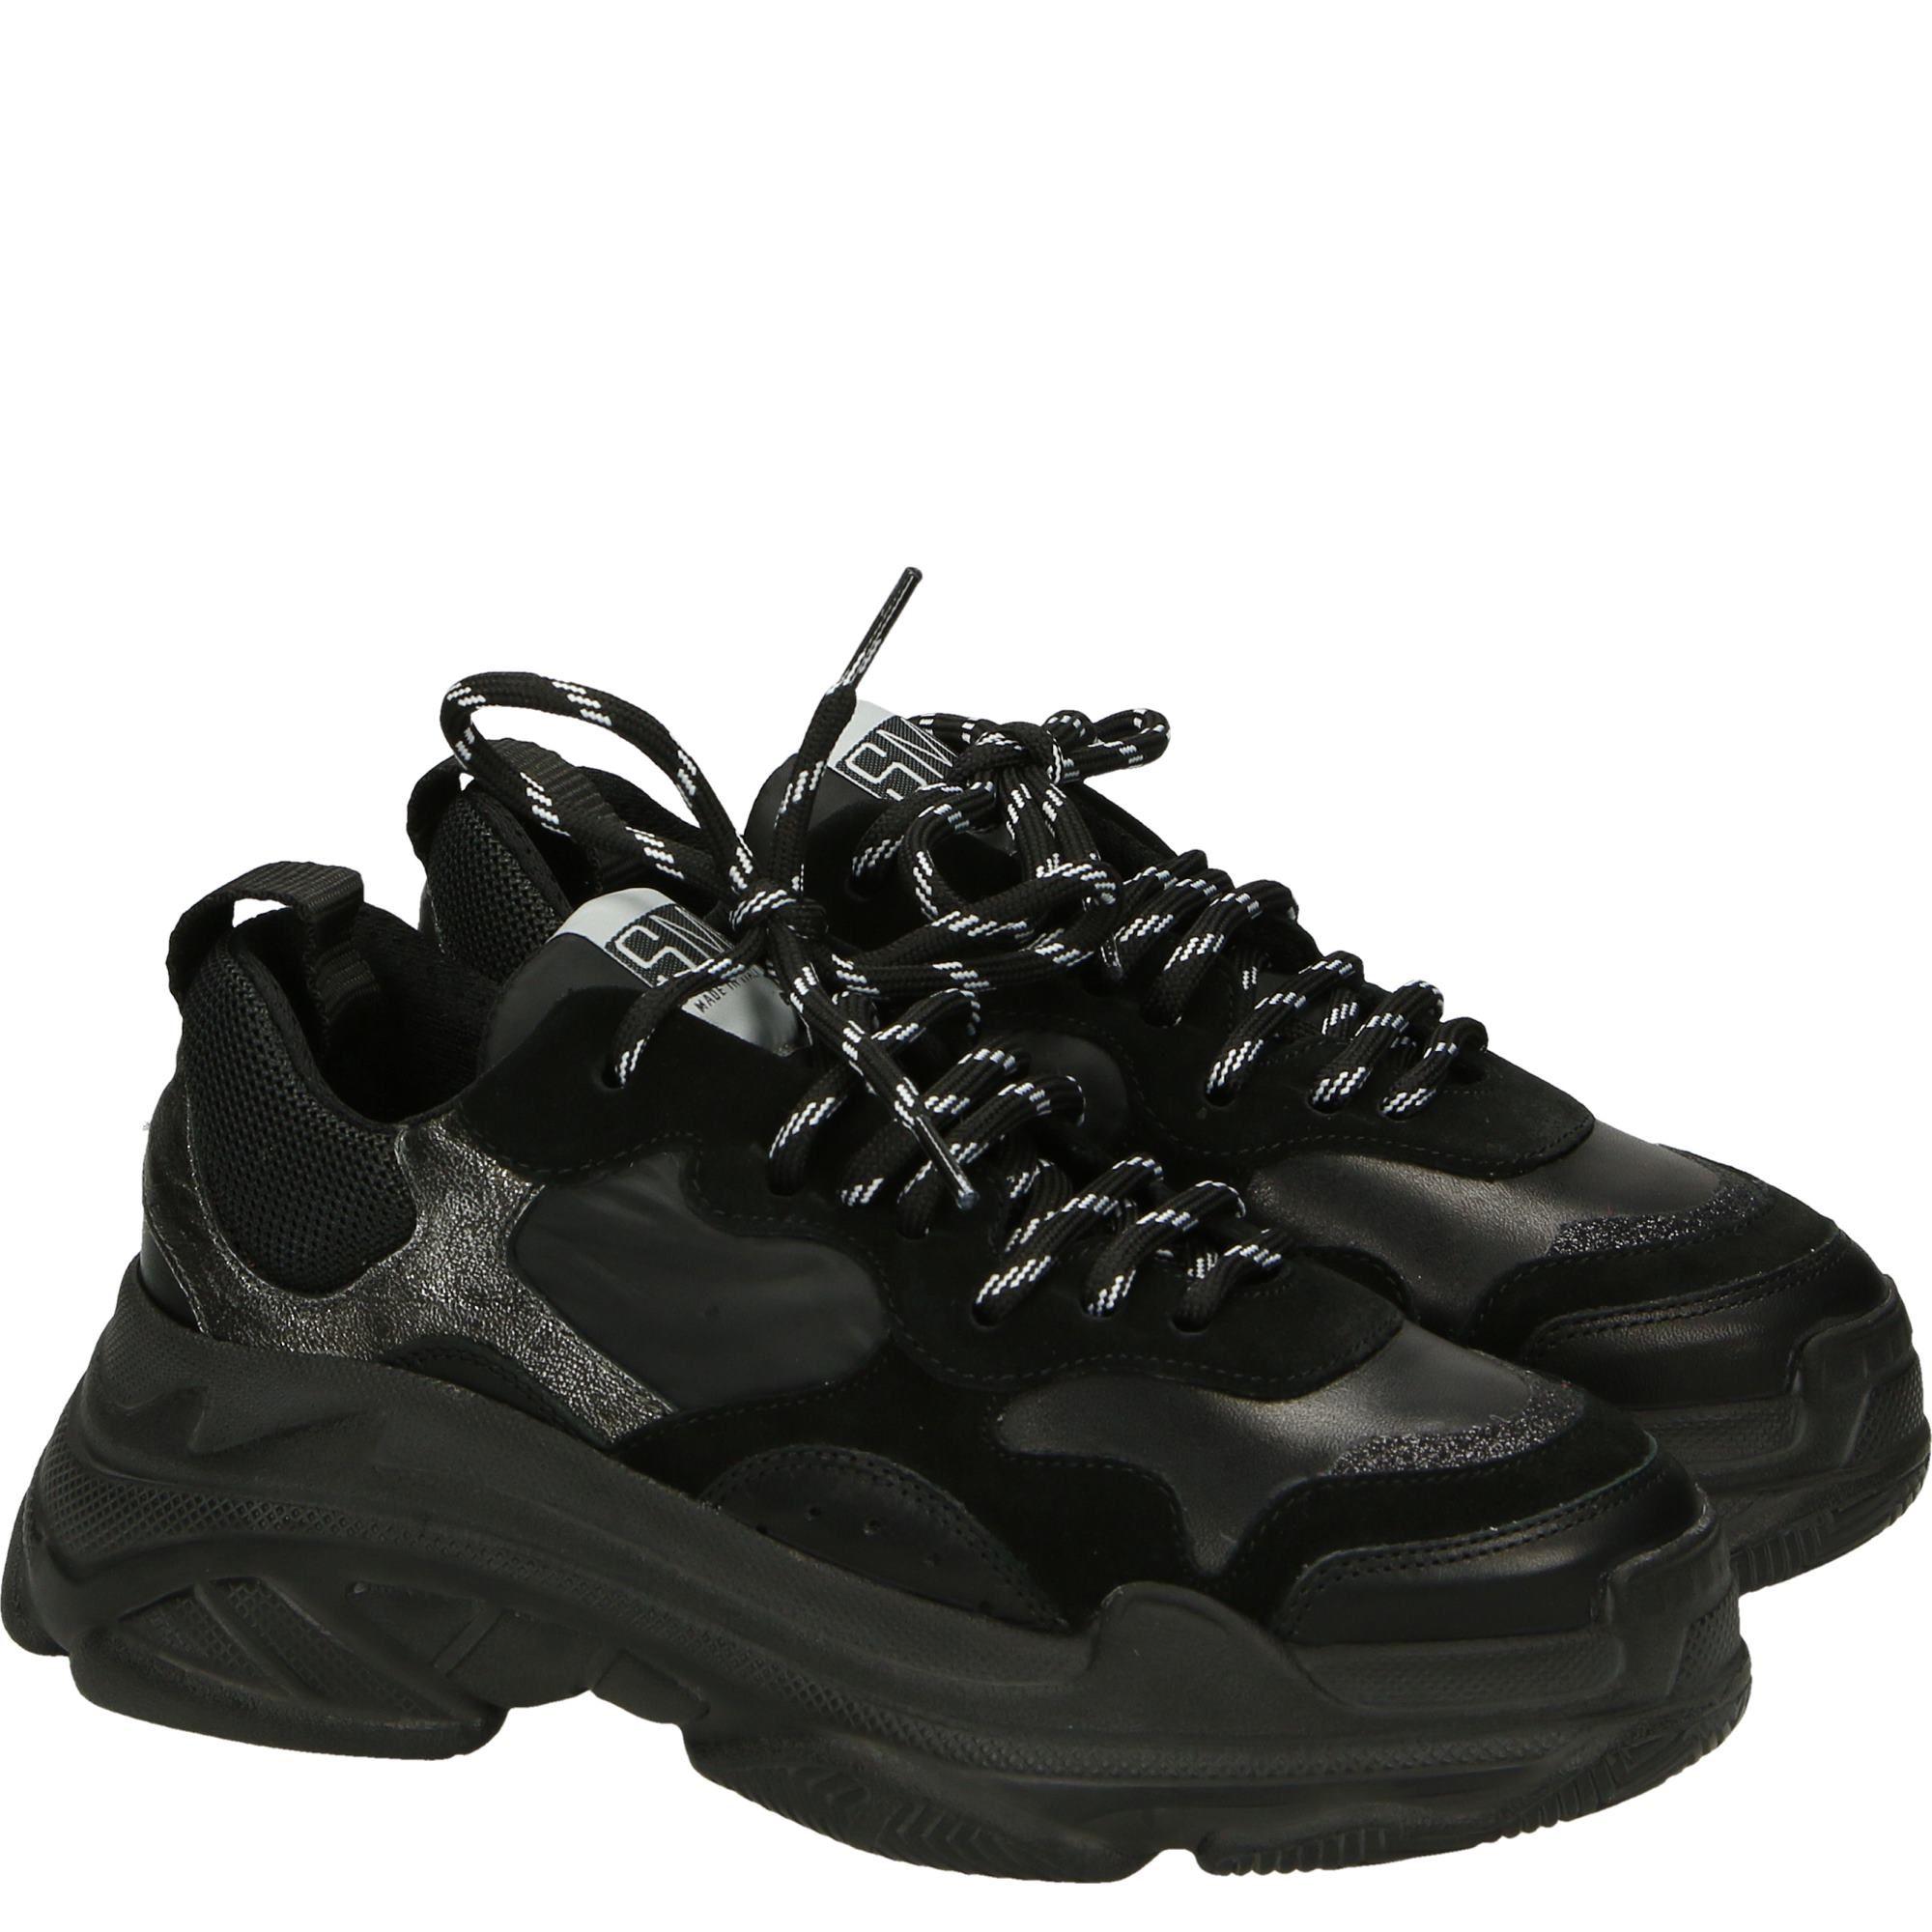 Sportowe Polbuty Na Masywnej Podeszwie Er337e1 V6 Ne Fa All Black Sneakers Boots Black Sneaker